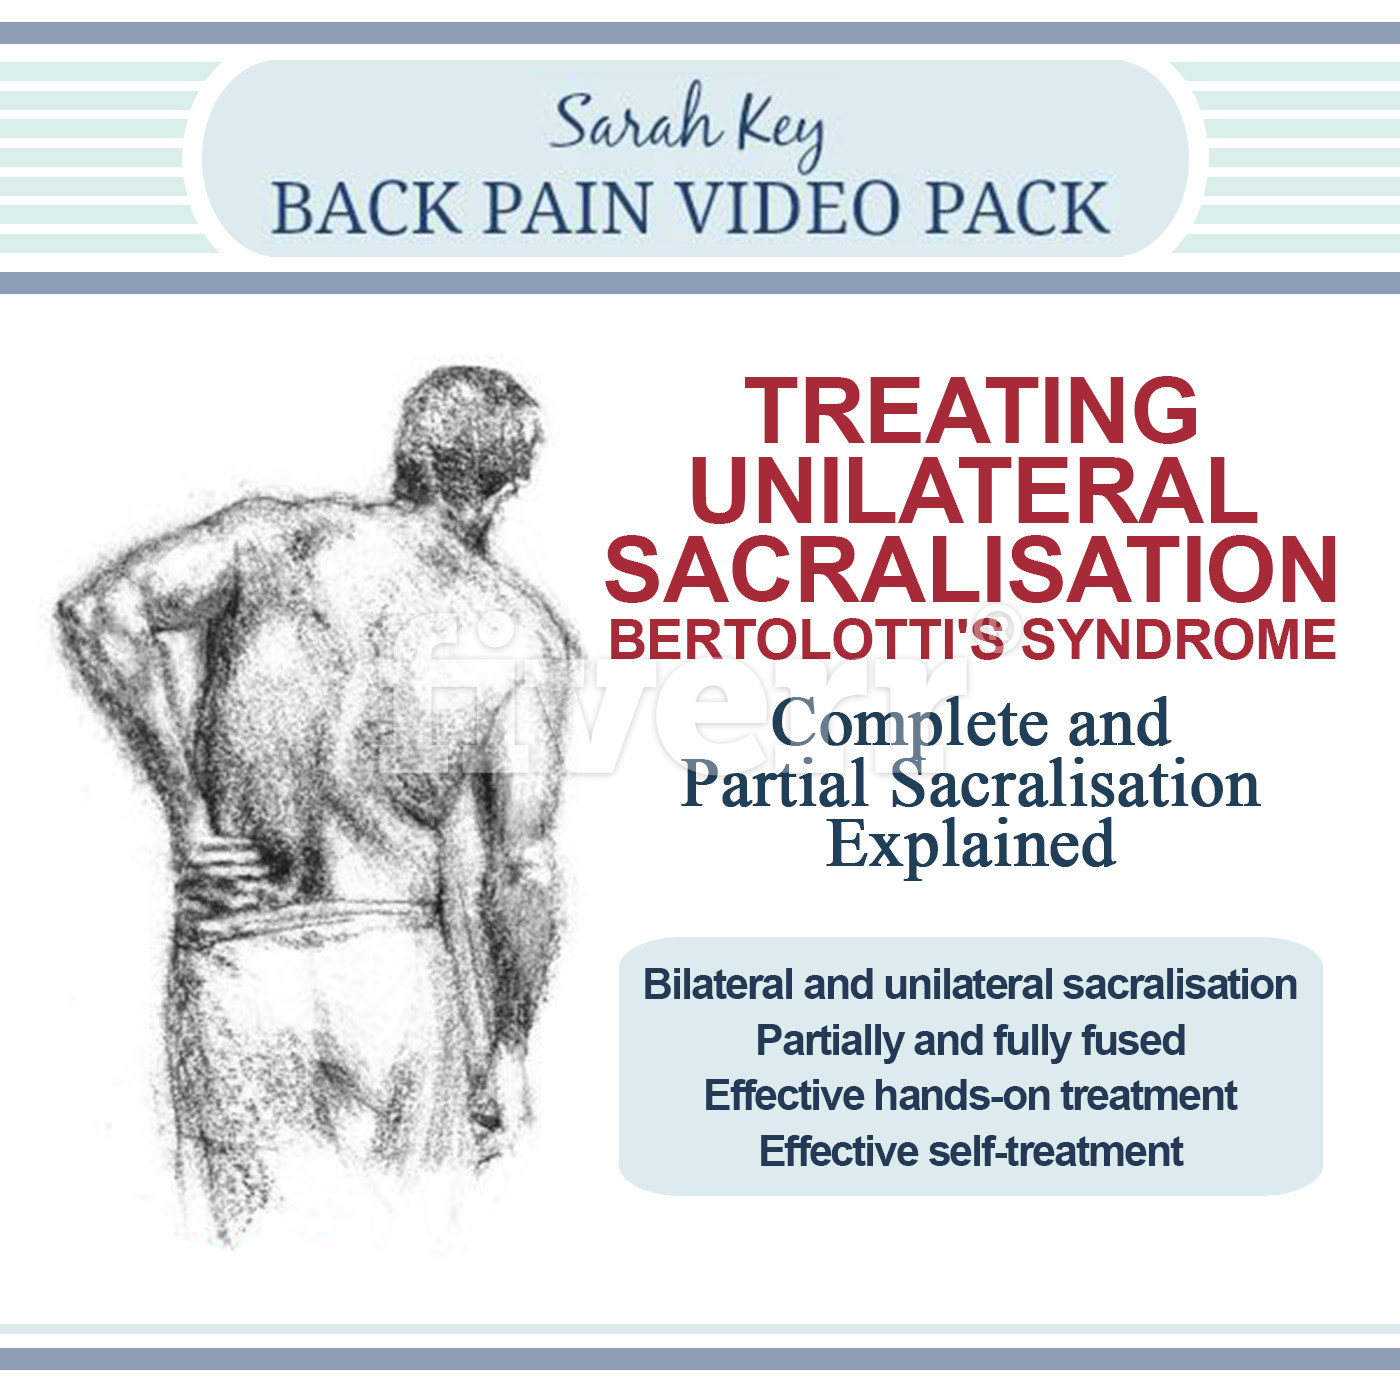 Lumbarisation And Sacralisation